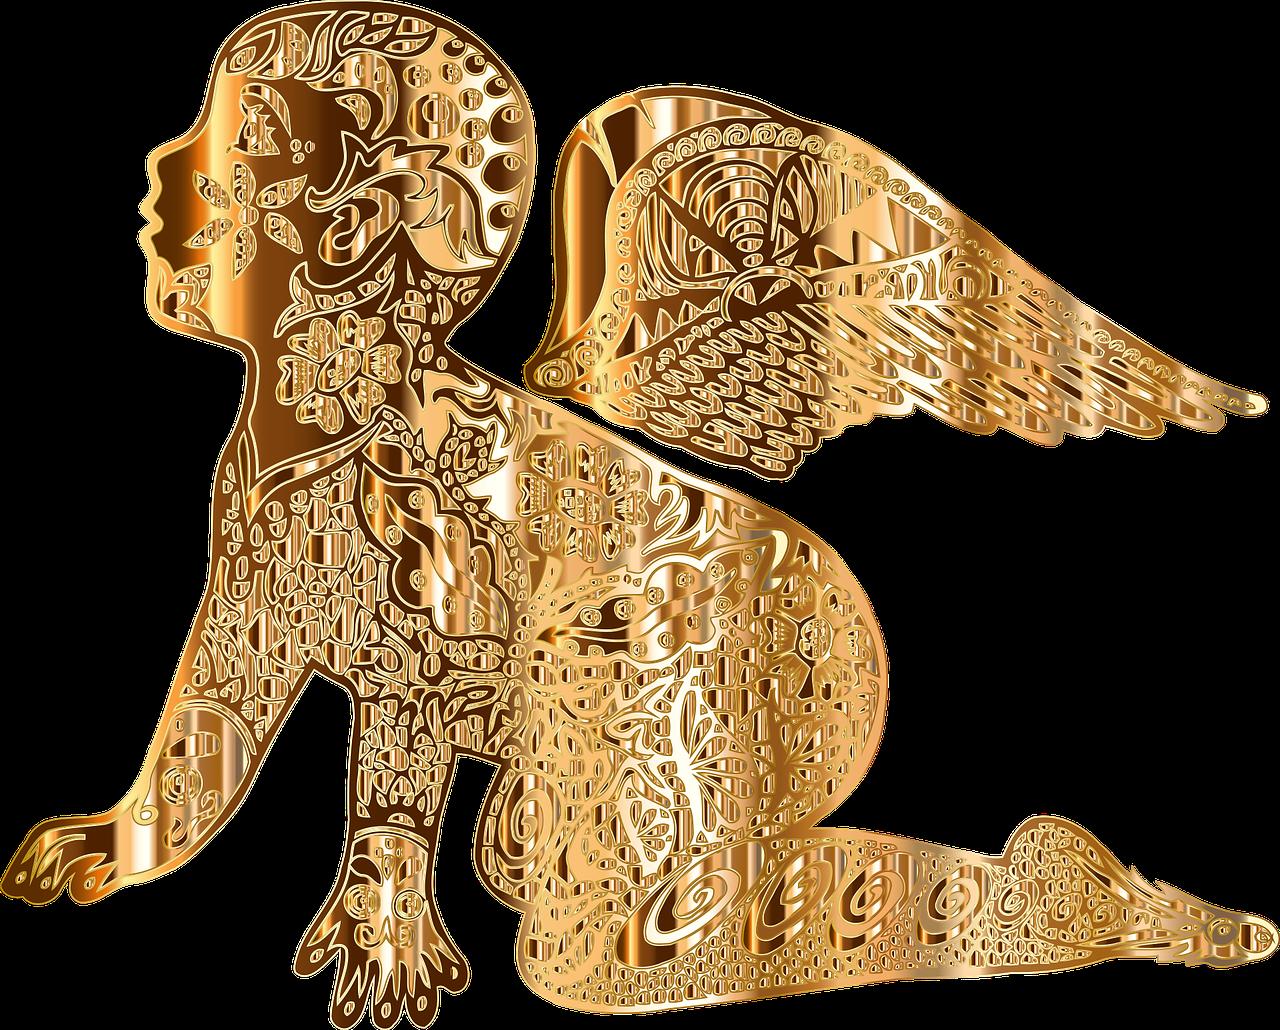 png royalty free Golden retriever clipart gold dog. Cherub angel clip art